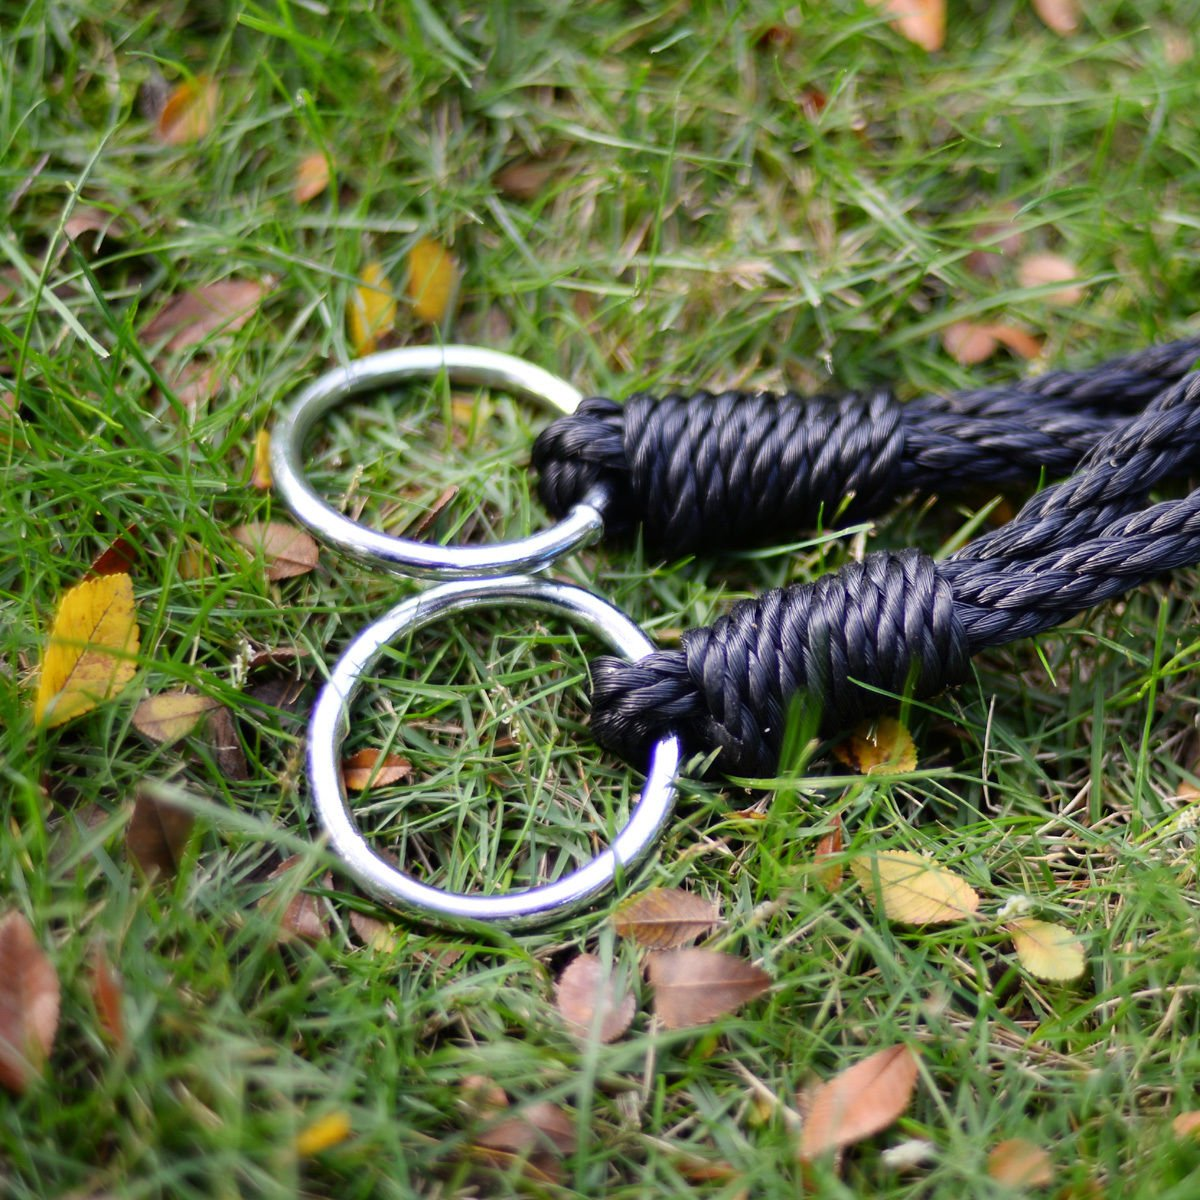 Platform Tree Spider Web Swing Kid Mesh 220 LBS 40'' Wide Hook Hanger Black Standard Web Hangers - House Deals by House Deals (Image #8)